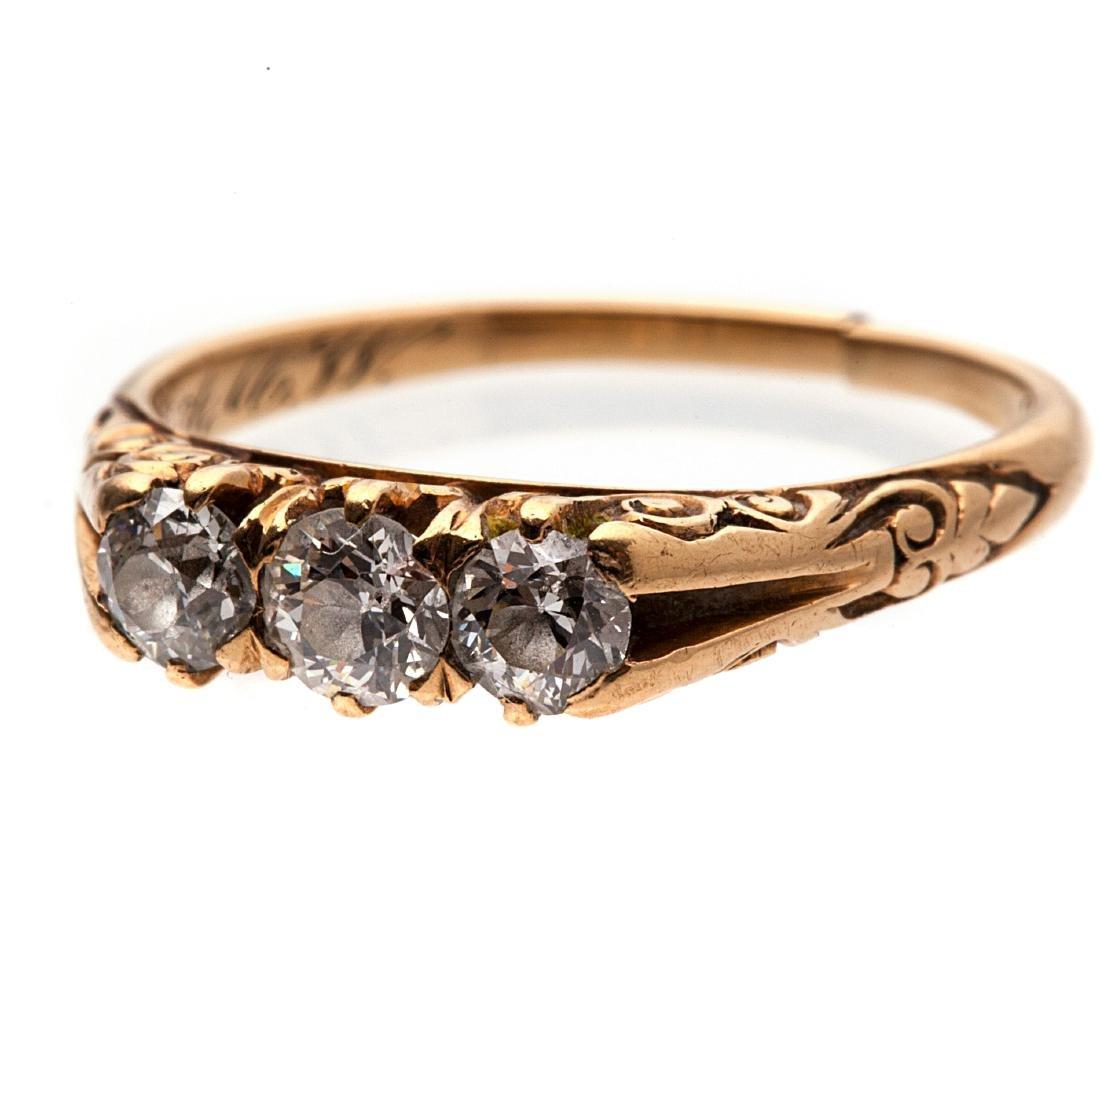 A Victorian diamond, 14k yellow gold ring